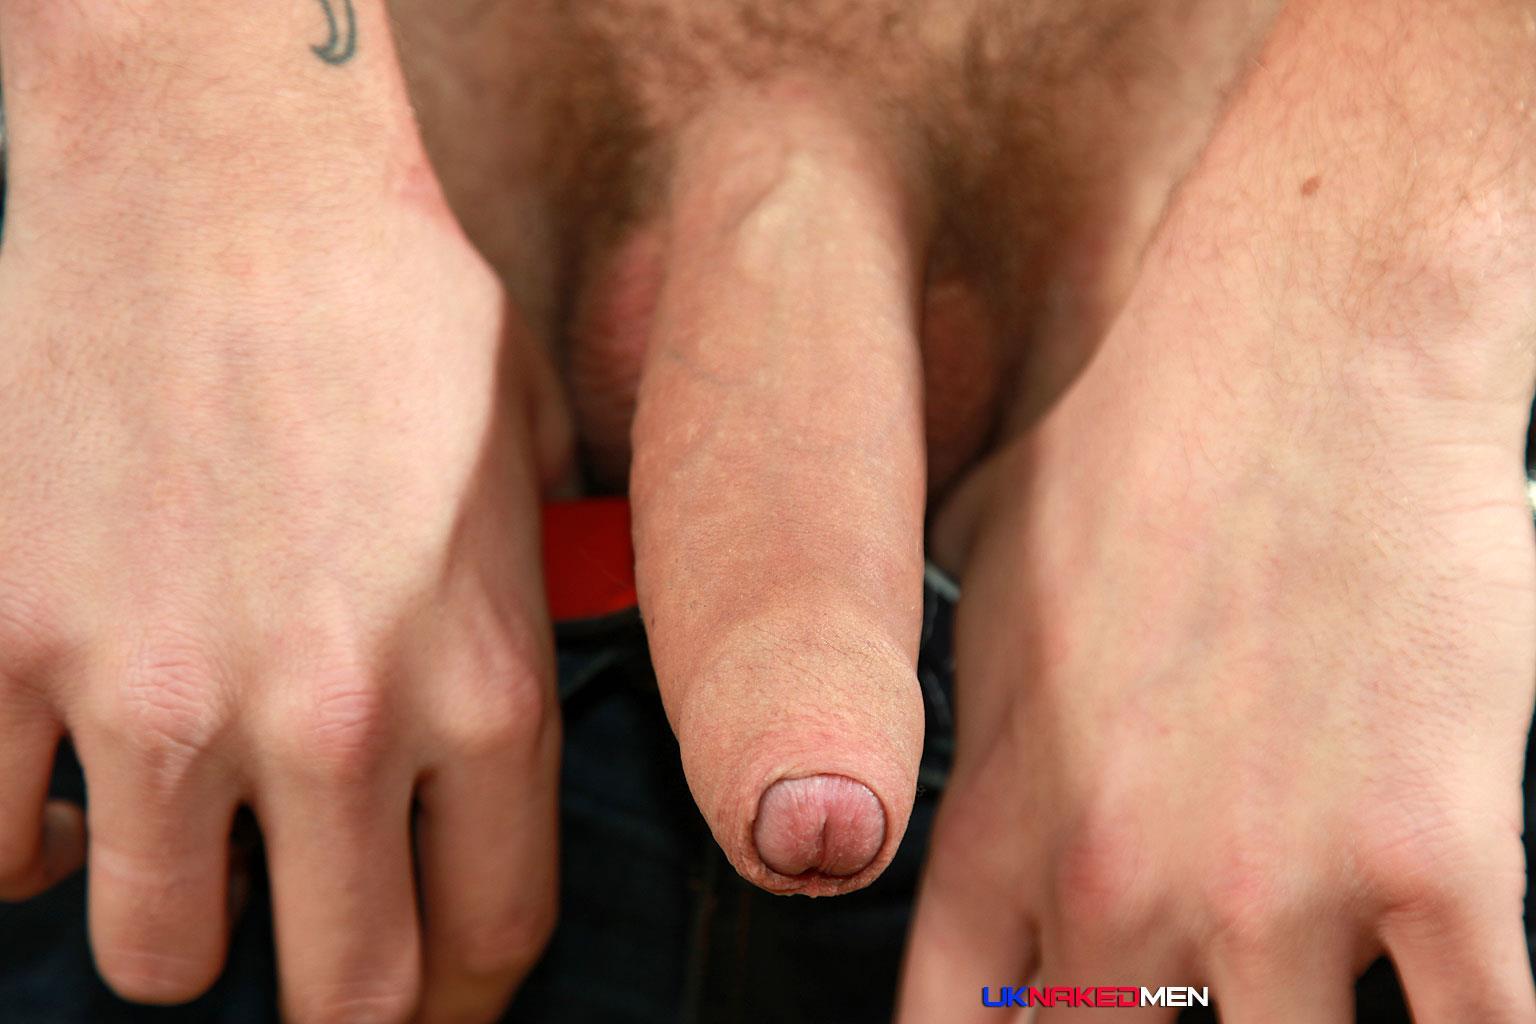 UK-Naked-Men-Dan-Stone-British-Guy-Naked-With-Big-Uncut-Cock-Amateur-Gay-Porn-03 Bisexual British Guy Dan Stone Jerking Off His Big Uncut Cock